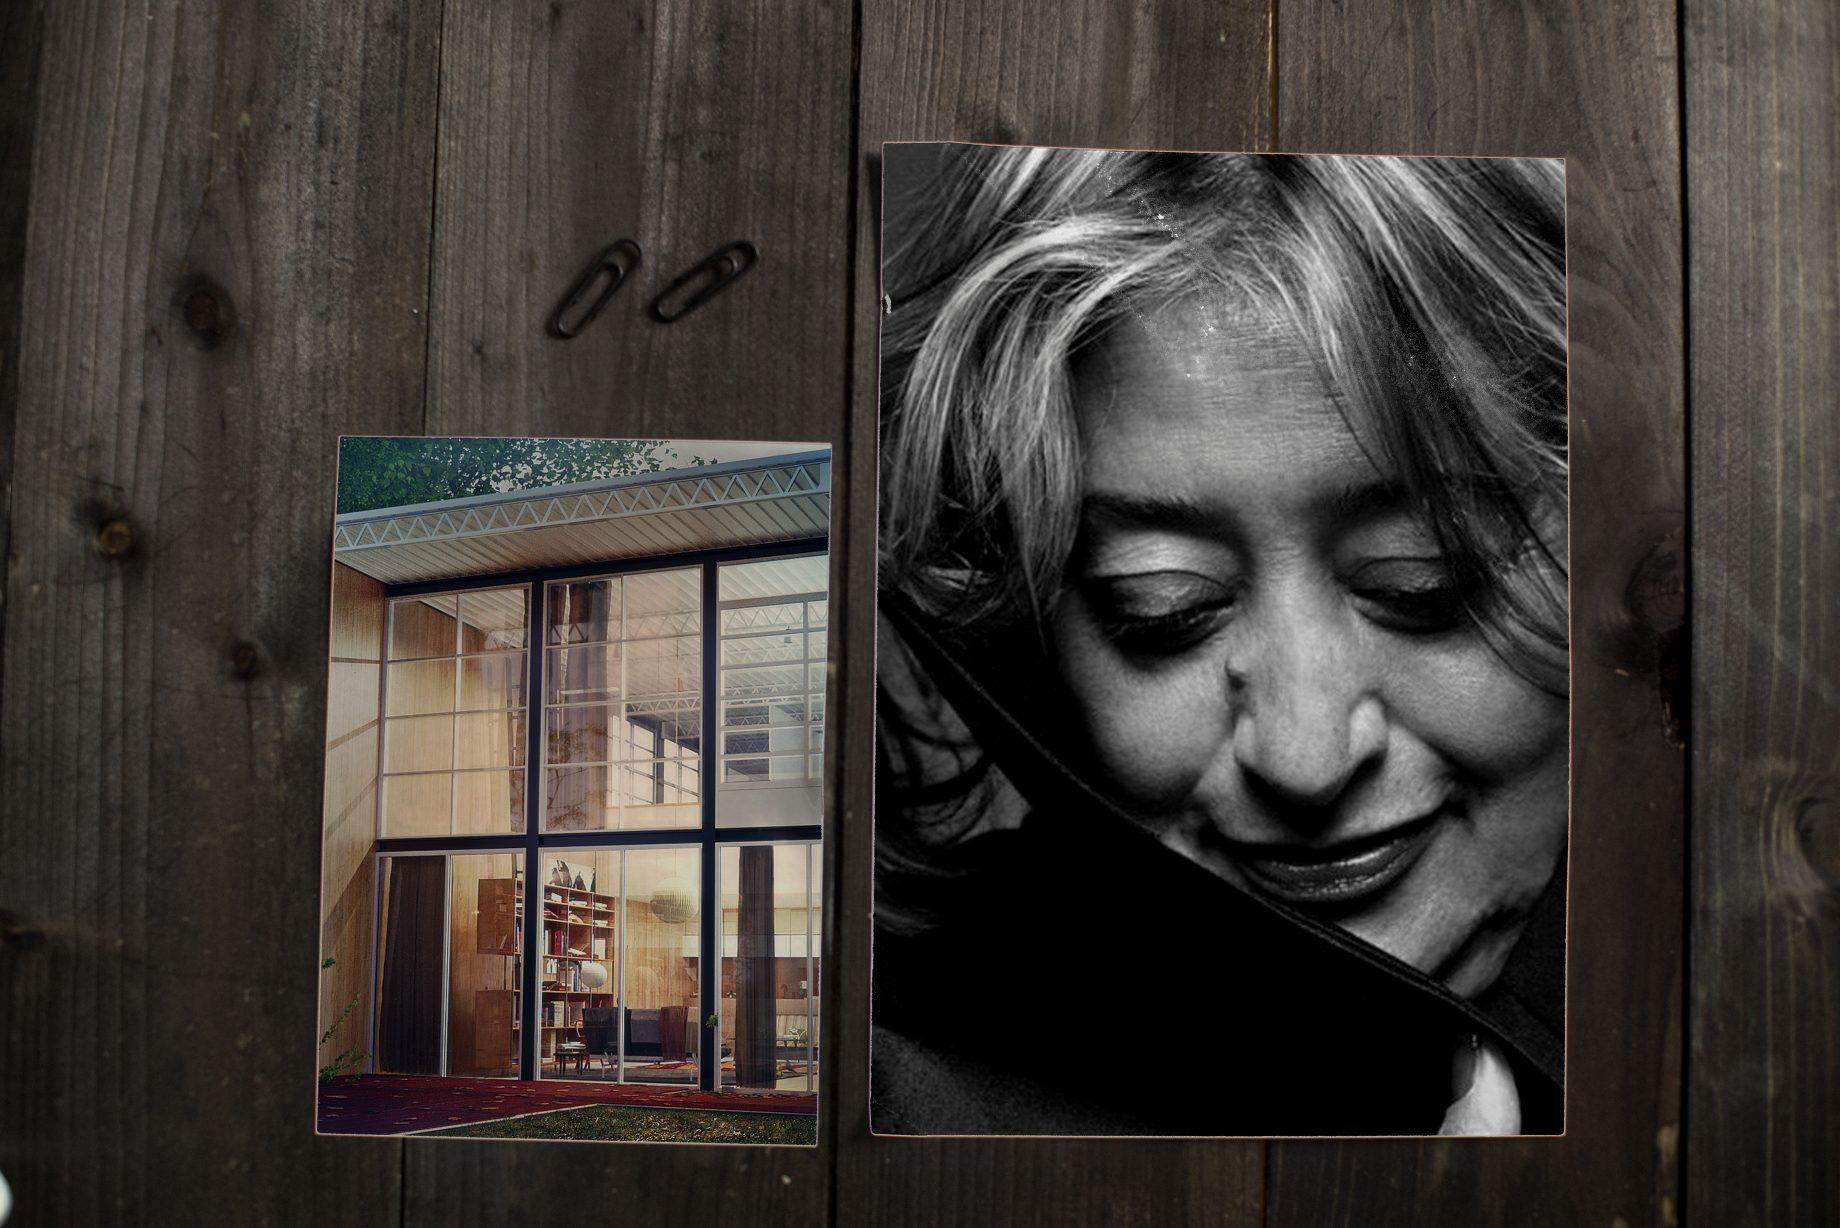 Mockup archiTEXTen Zaha Hadid Eames House Architektur